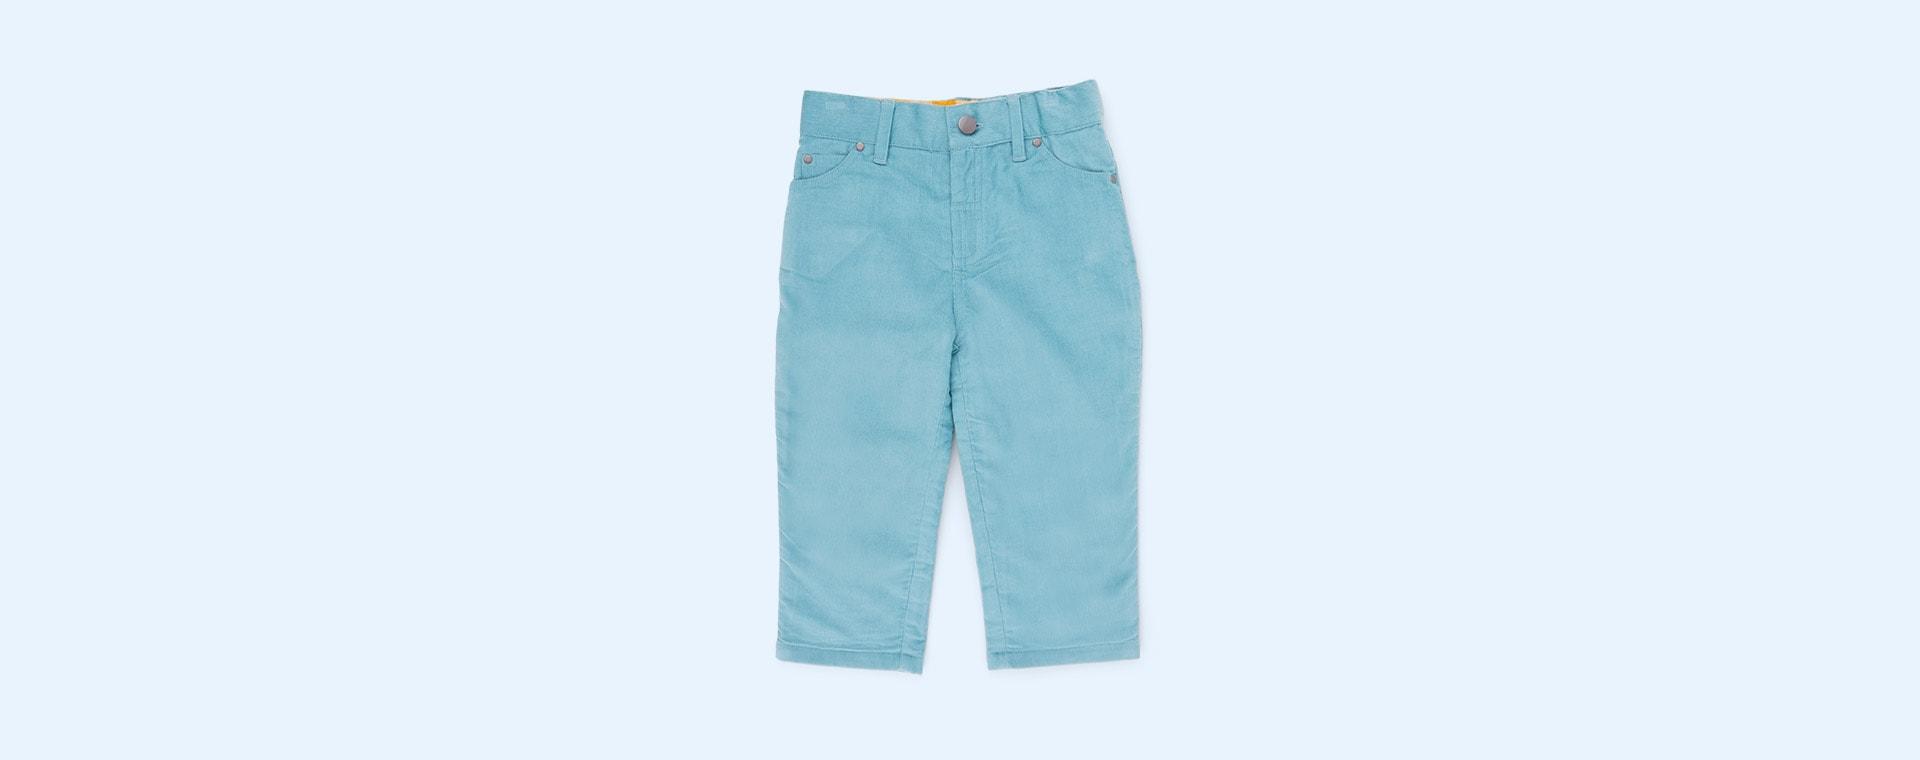 Blue Little Green Radicals Cord Adventure Jeans